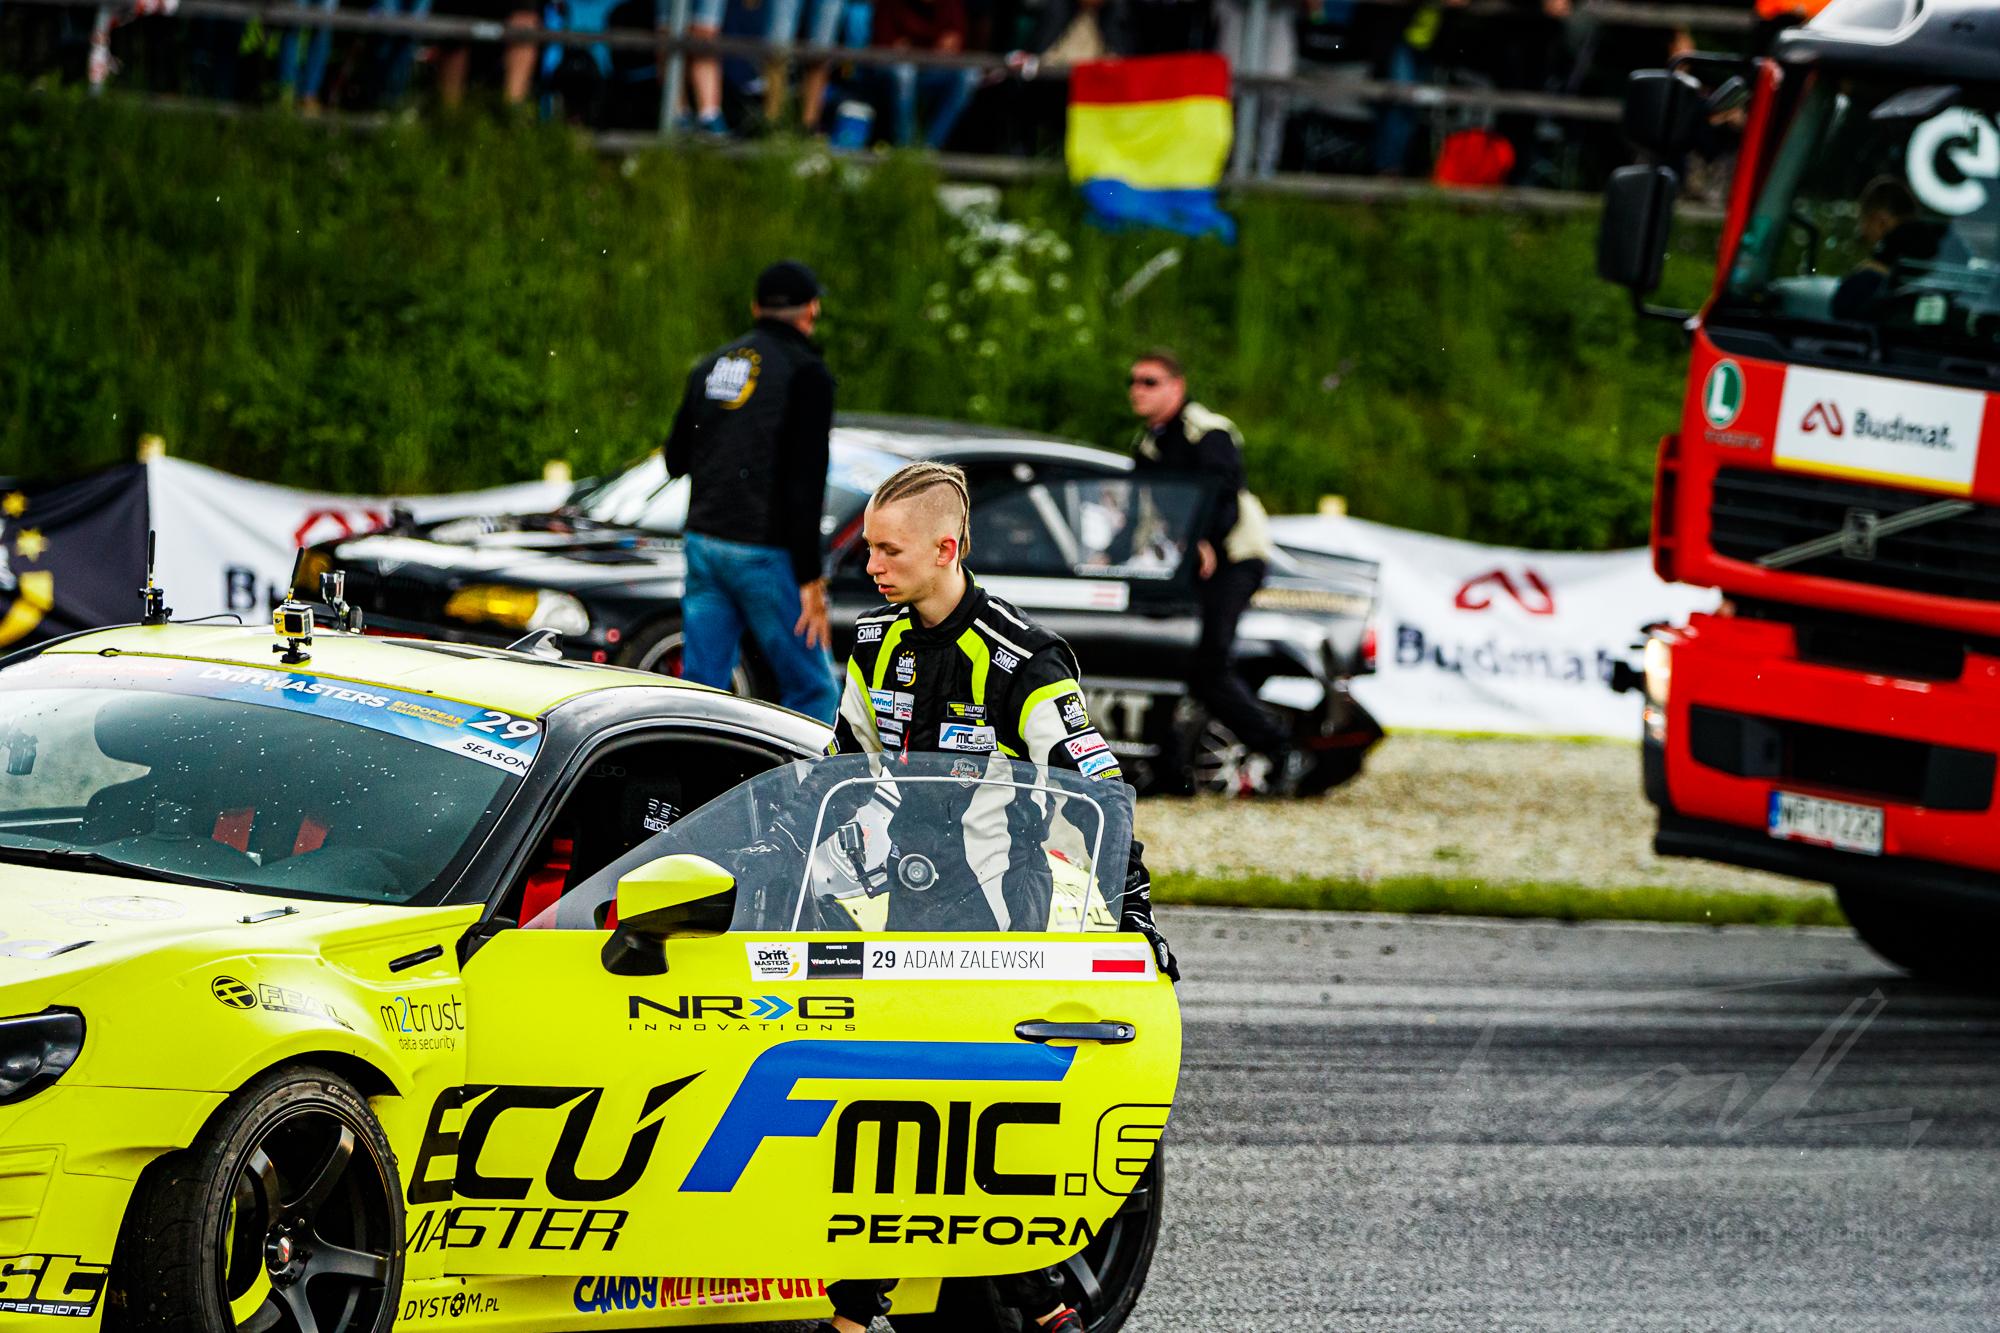 Driftmasters-GP-Greinbach-2019-64